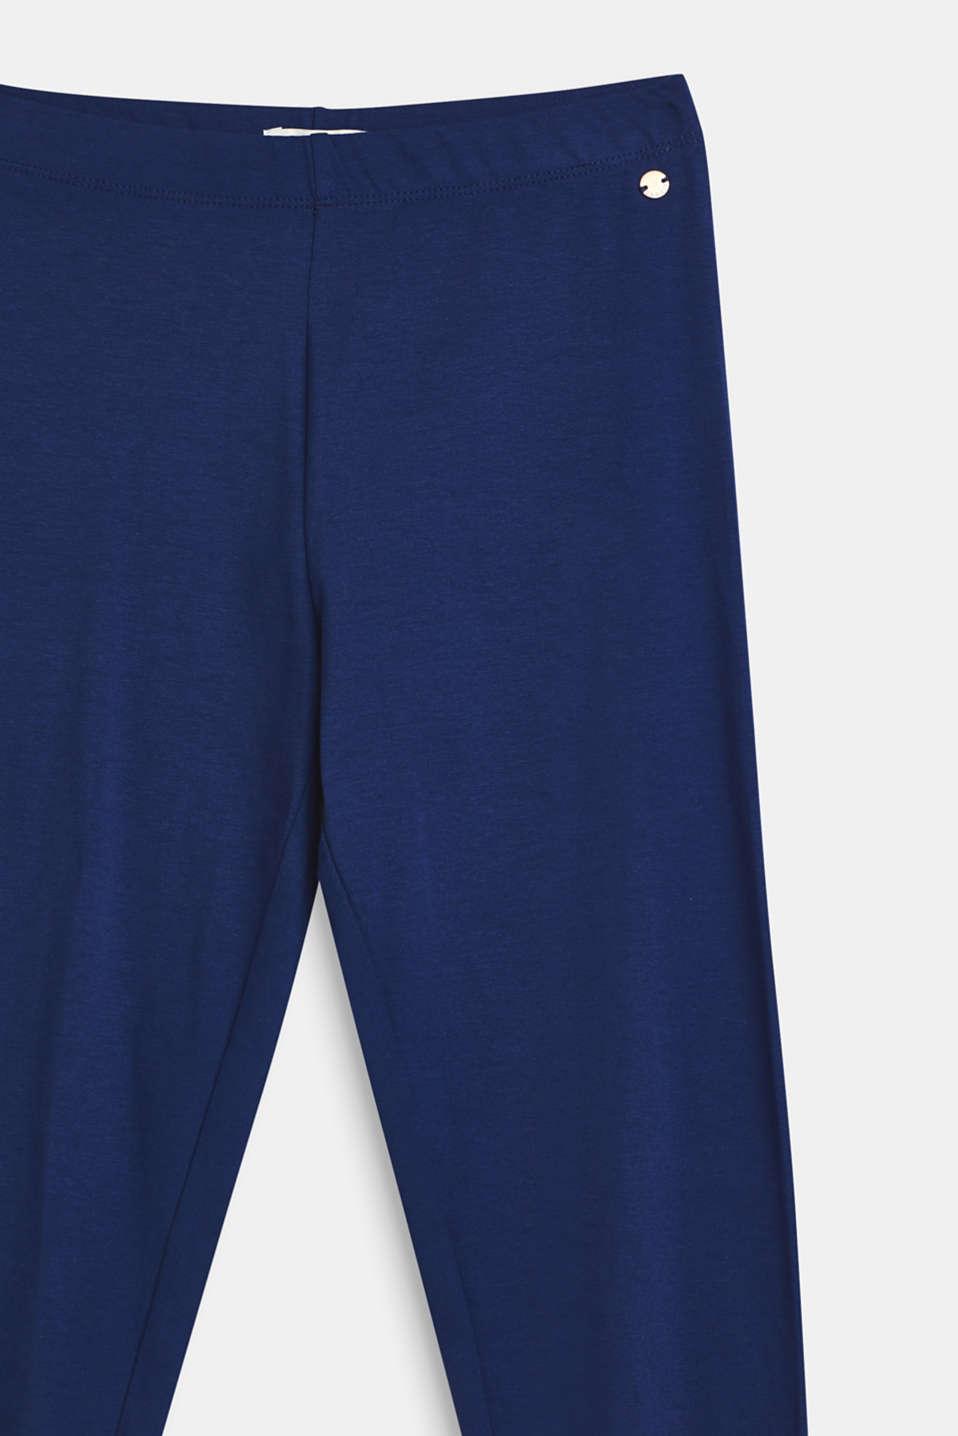 Basic stretch cotton leggings, LCMARINE BLUE, detail image number 2